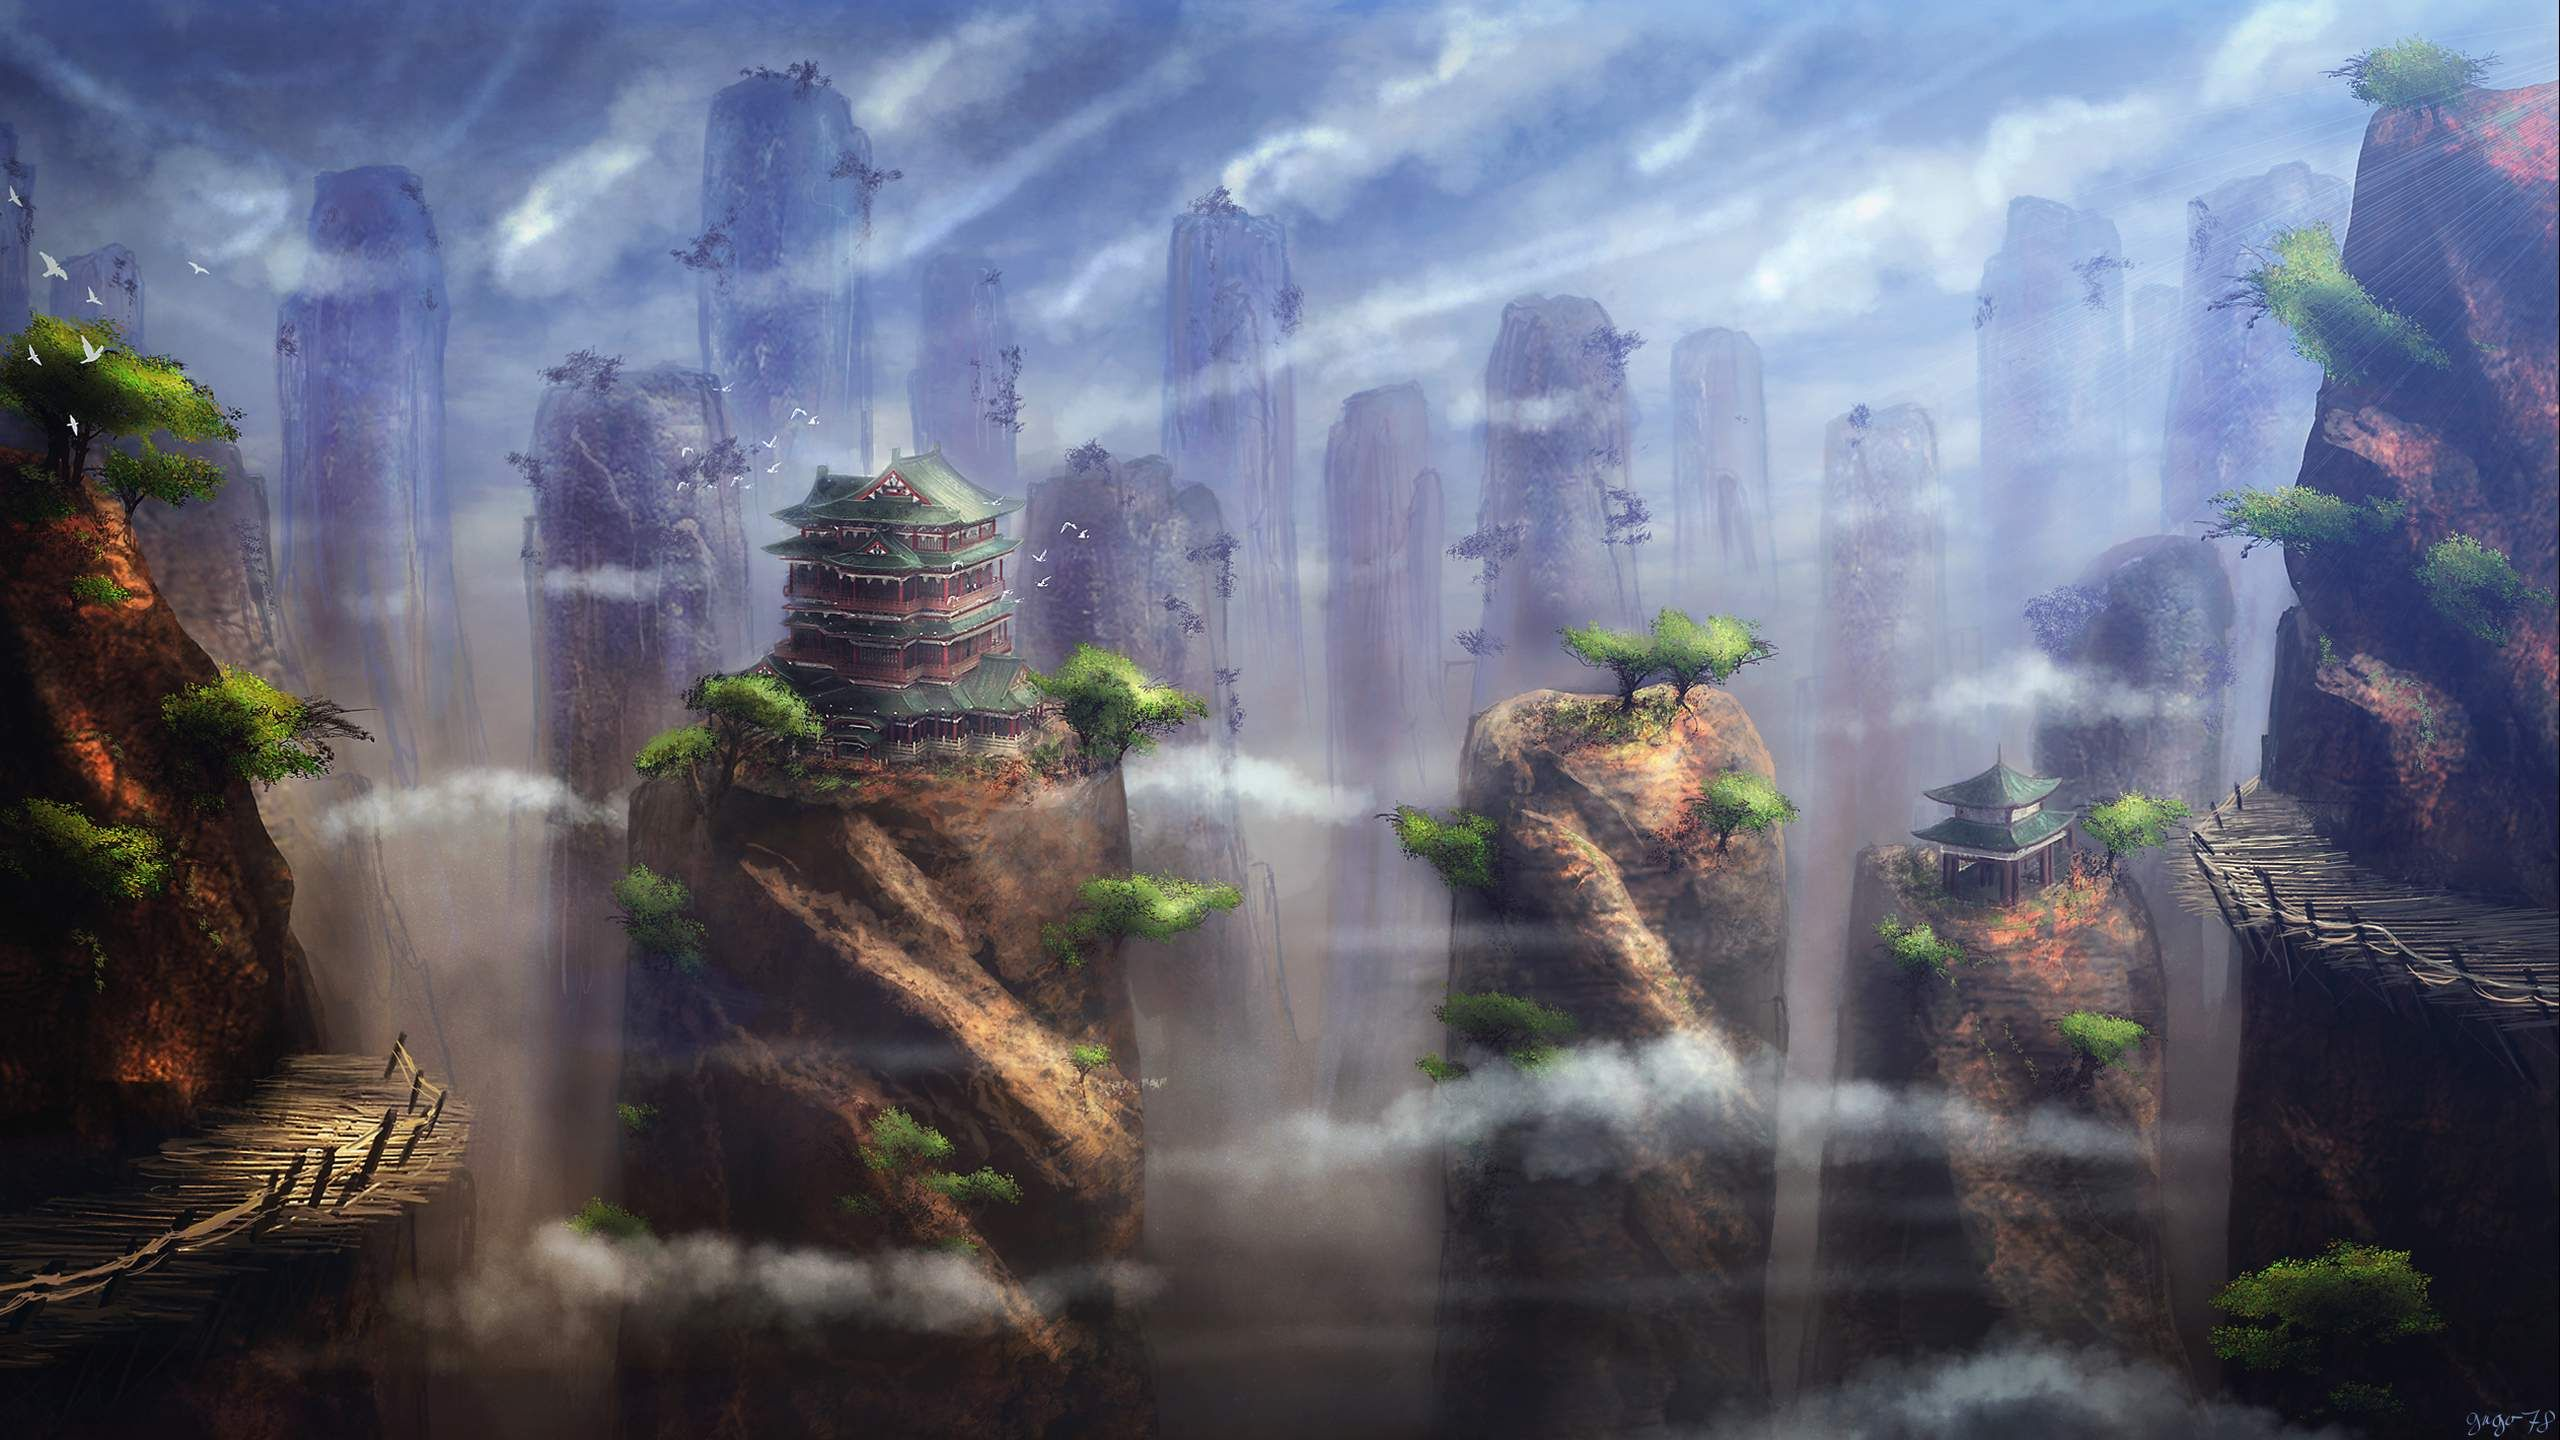 Fantasy Landscape Painting Hd Wallpaper Download For Desktop Fantasy Landscape Landscape Paintings Background Images